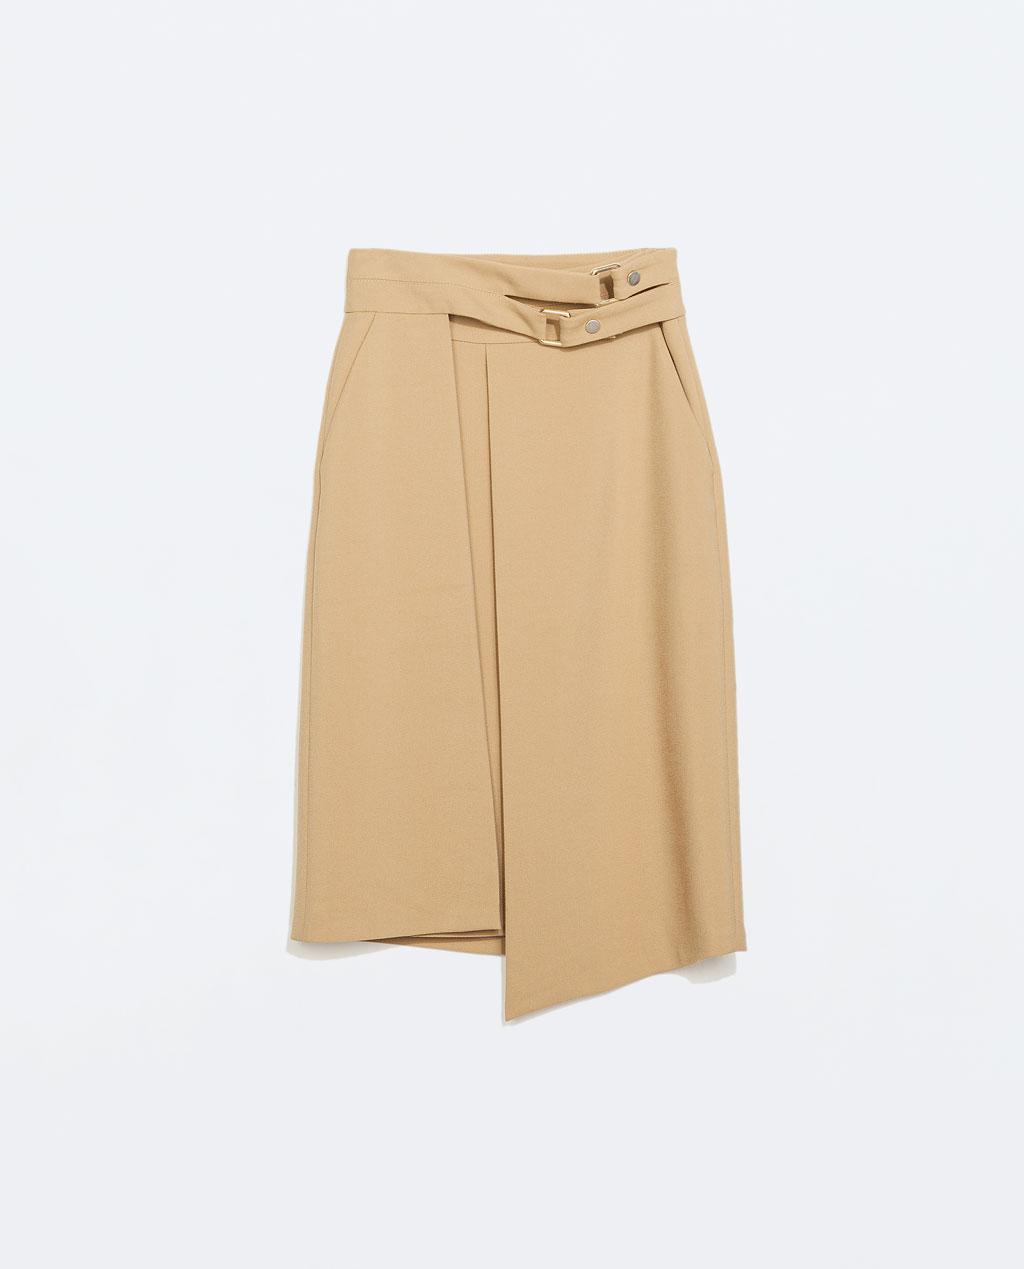 Zara - Jupe(60 €)